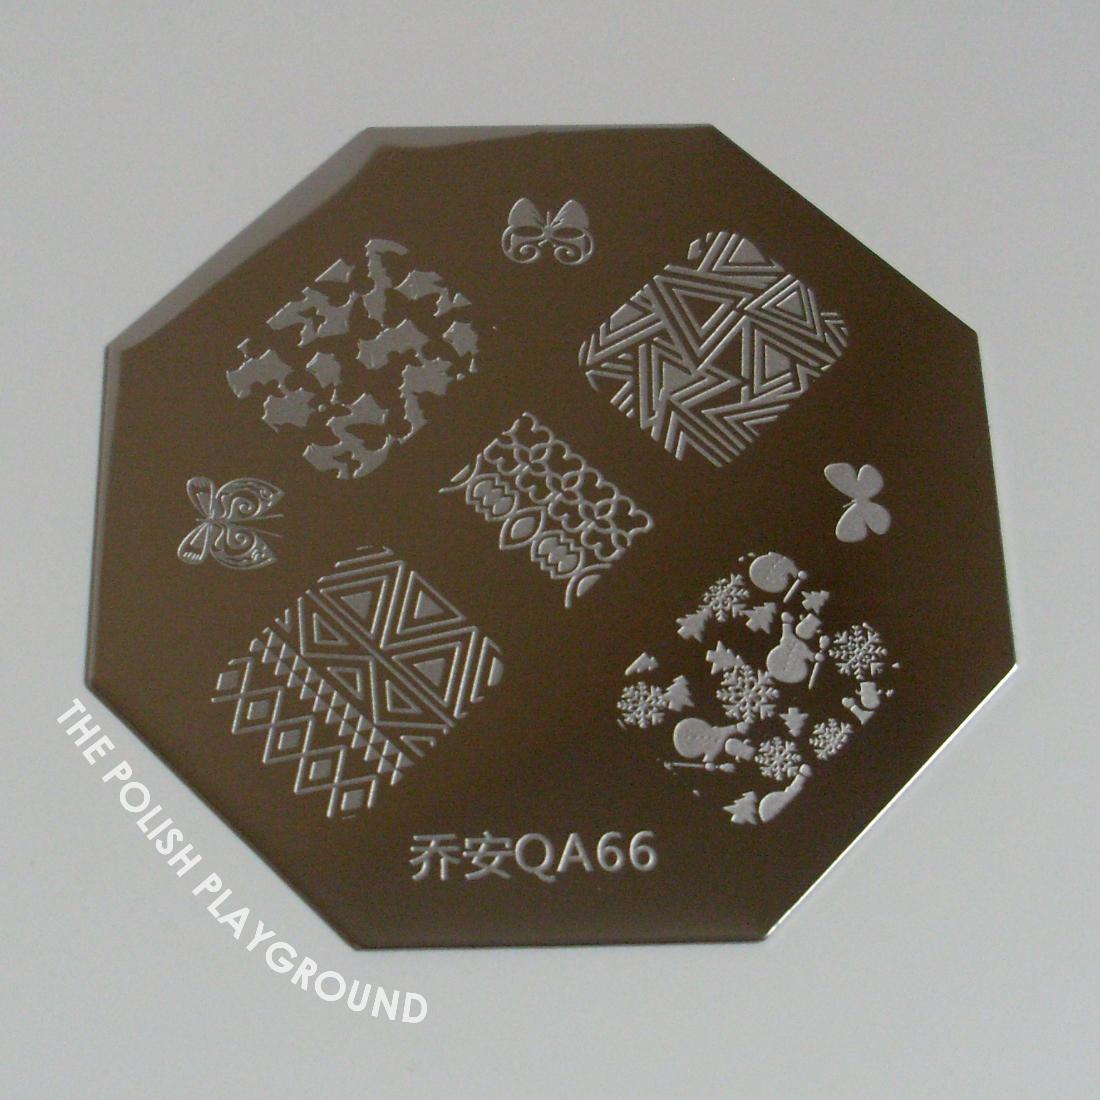 Born Pretty Store QA66 Nail Stamping Plate